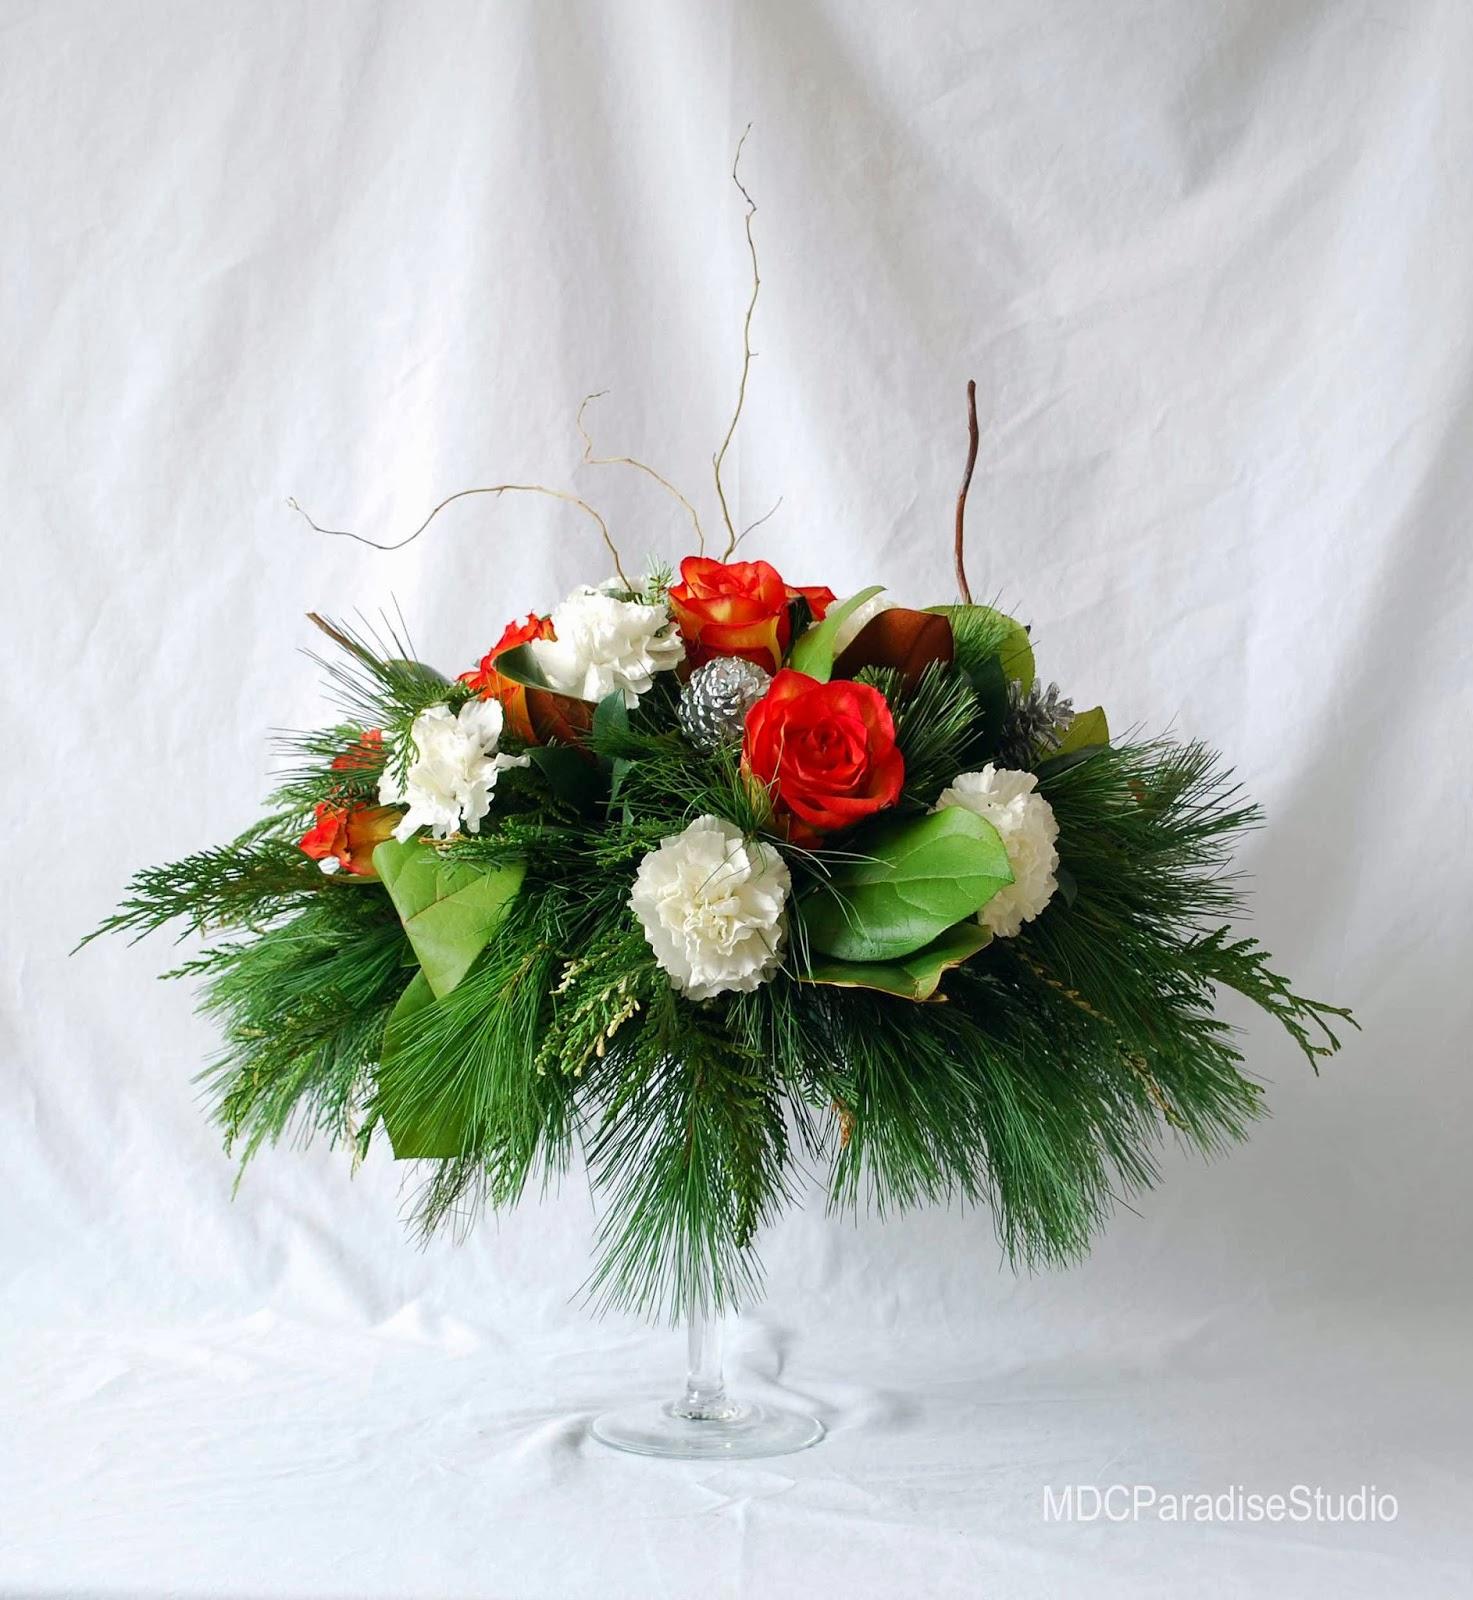 Contemporary Christmas Flower Arrangements